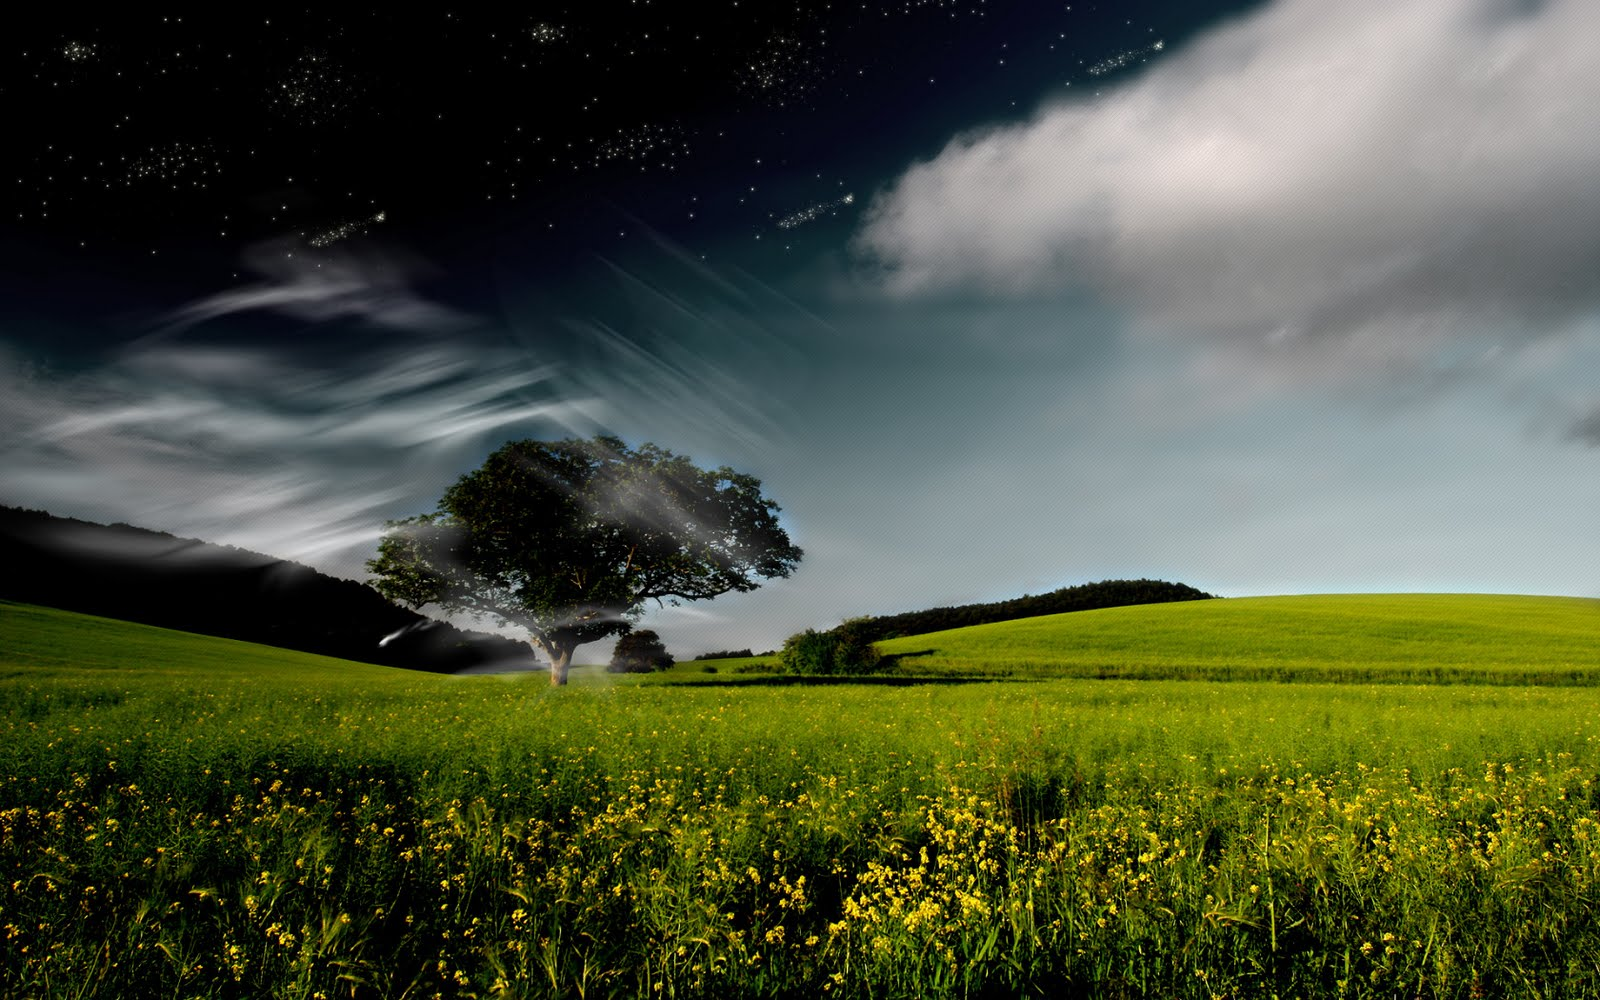 Nature Fantasy Pictures Widescreen Hd Desktop Wallpaper 1600x1000